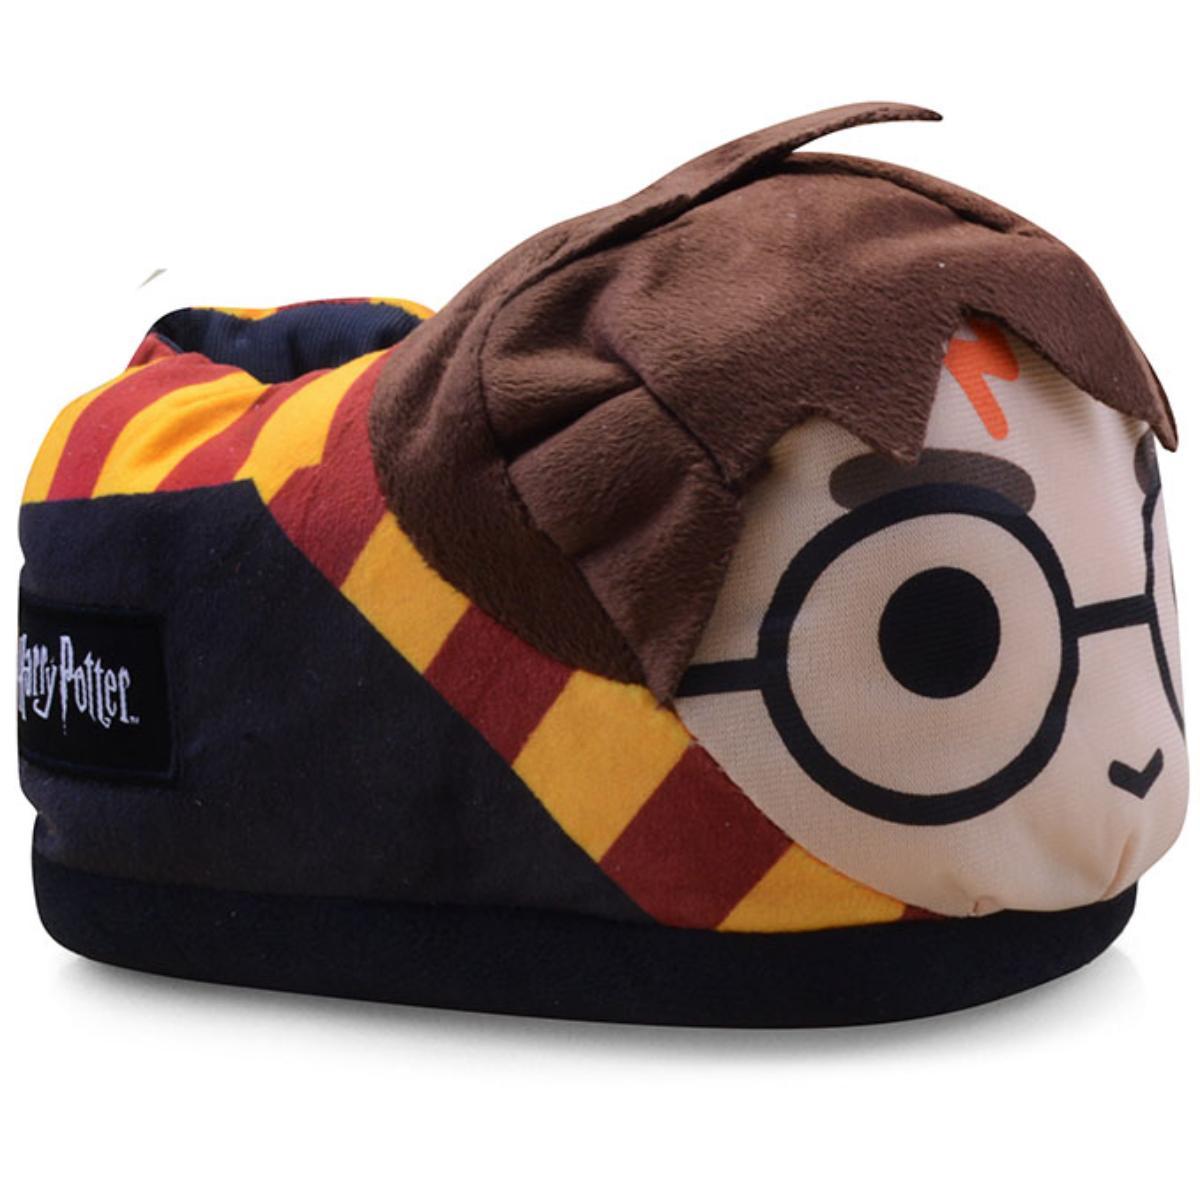 Pantufa Masc Infantil Ricsen 119120 Harry Potter 3d Preto/amarelo/marrom